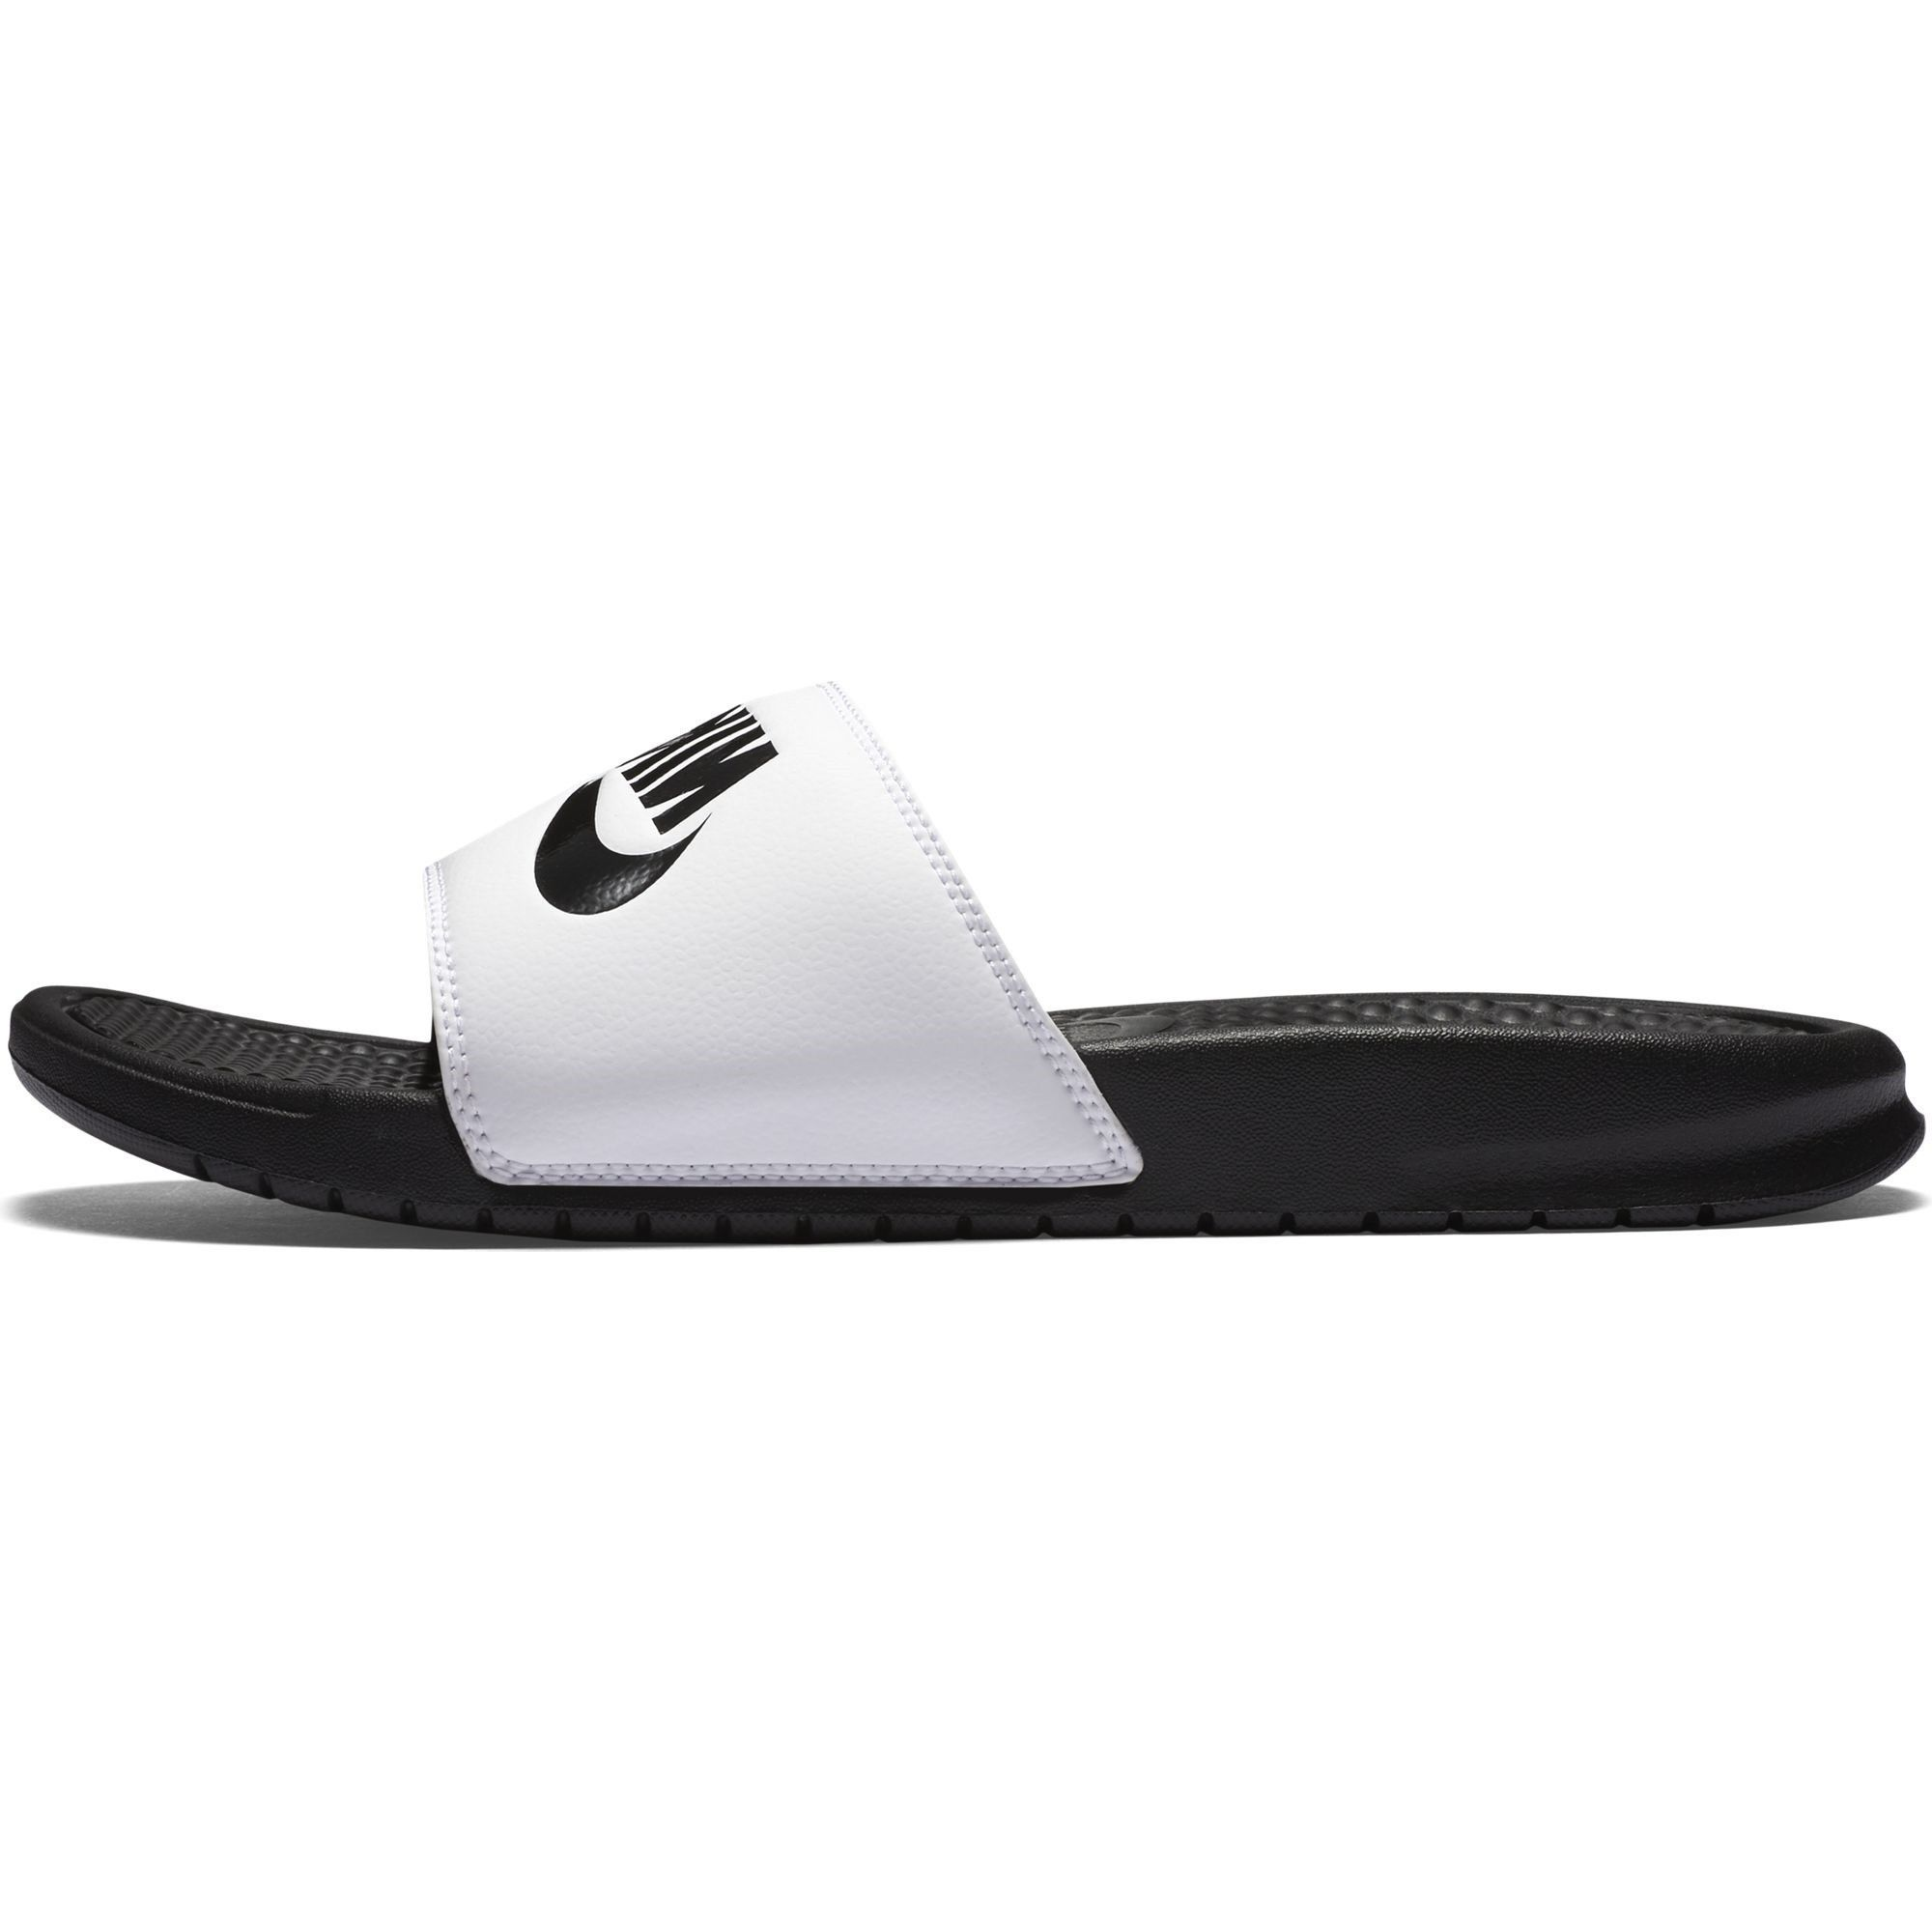 new product 75151 919ad Sandale Nike Benassi - 343880-100 - Pegashoes